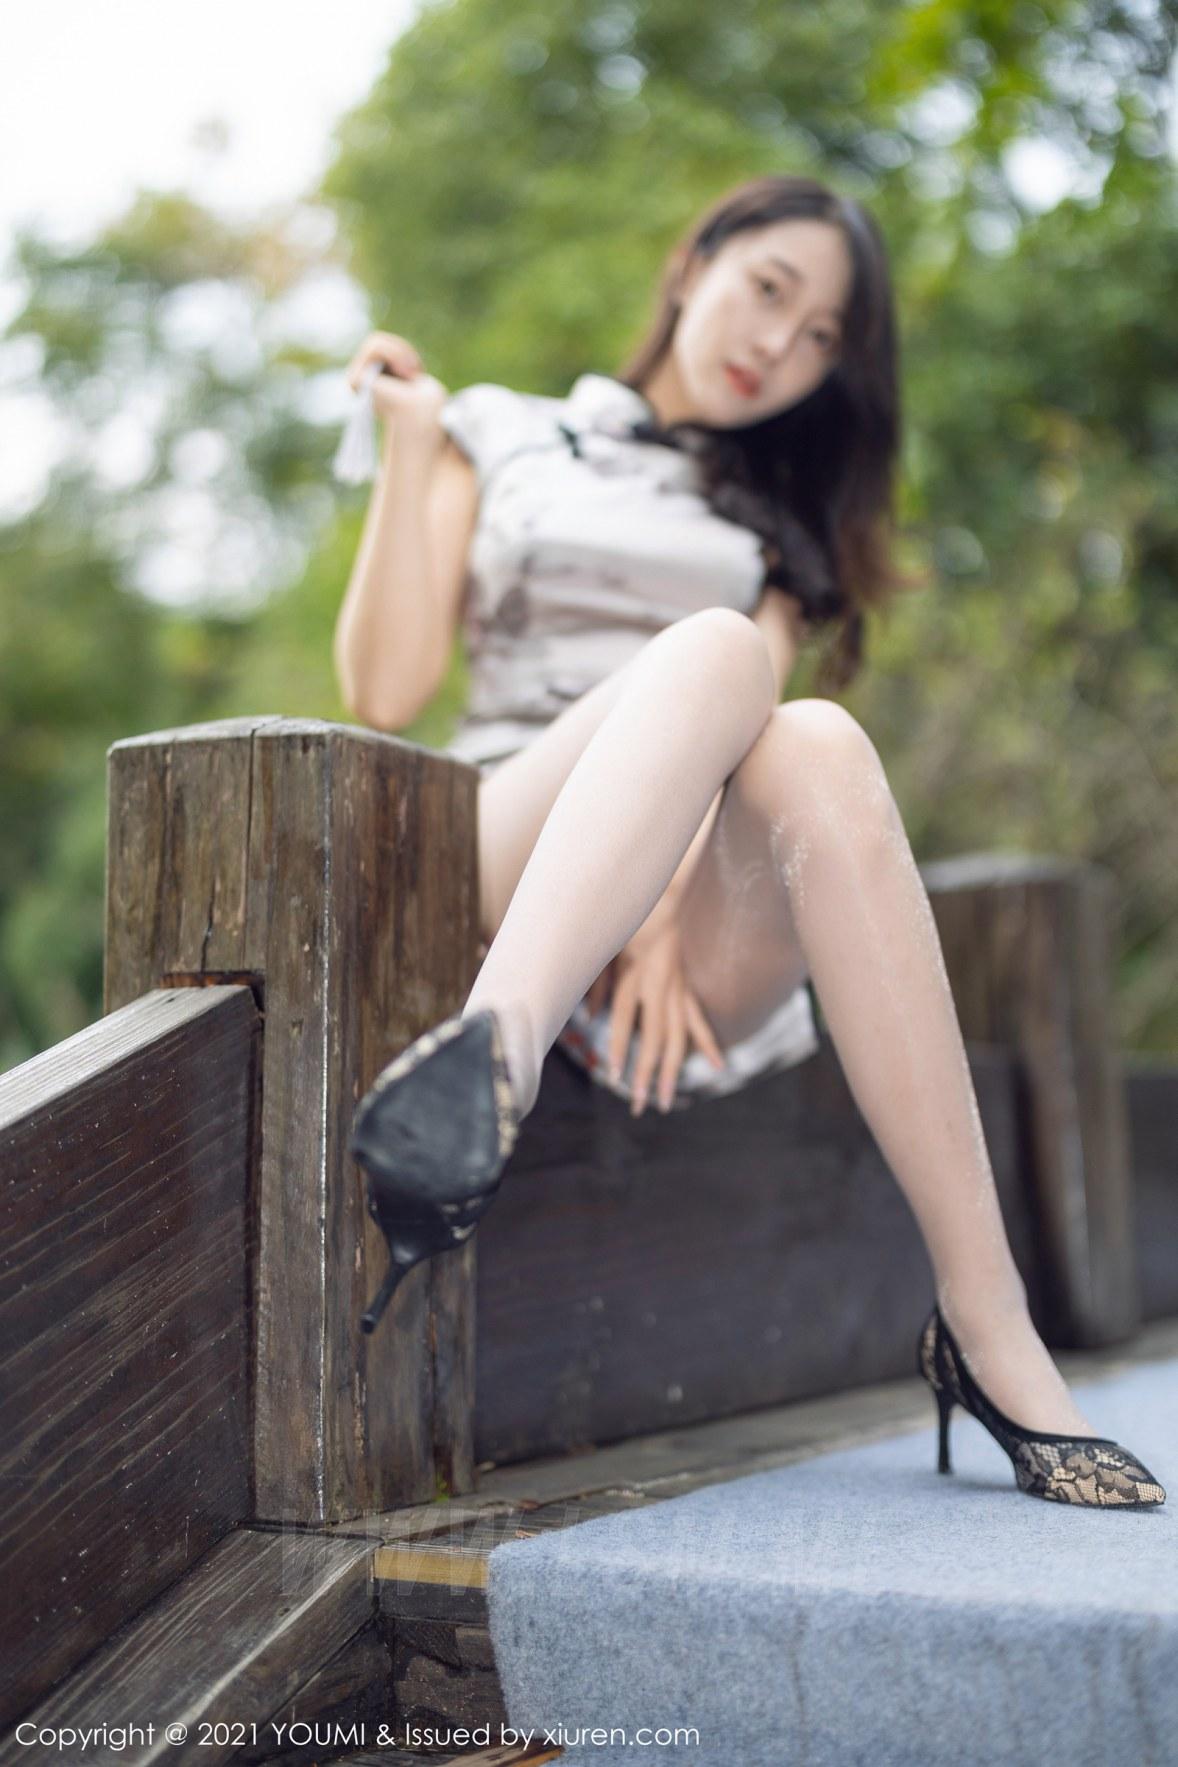 635 035 scb 3600 5400 - YOUMI 尤蜜荟 Vol.635  浪漫旗袍 玥儿玥er - 尤蜜荟 -【免费在线写真】【丽人丝语】